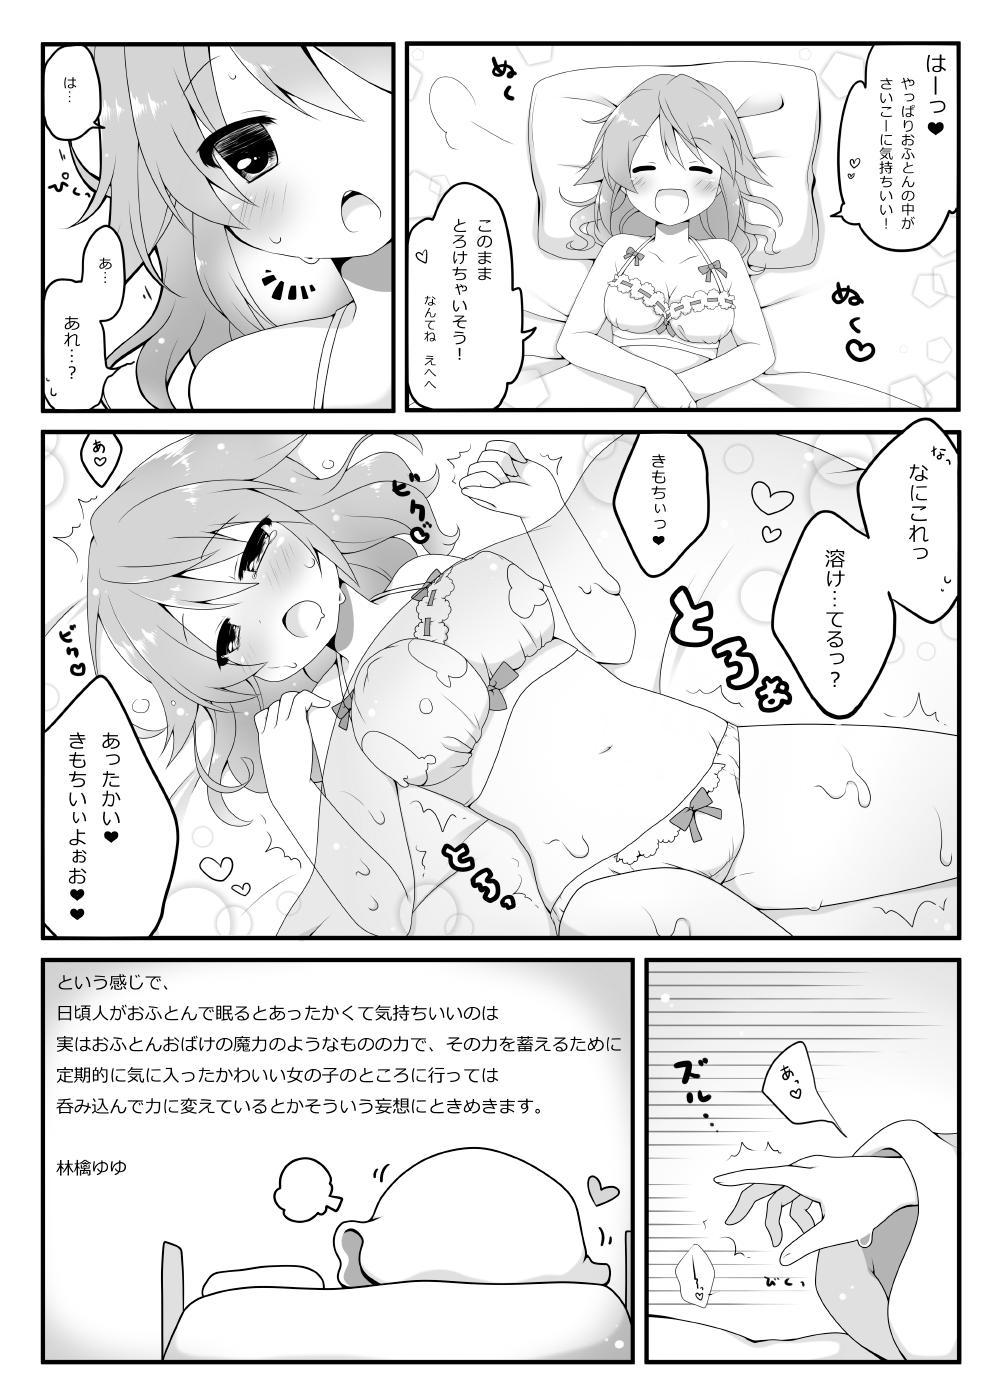 Peaceful☆Revolution 122